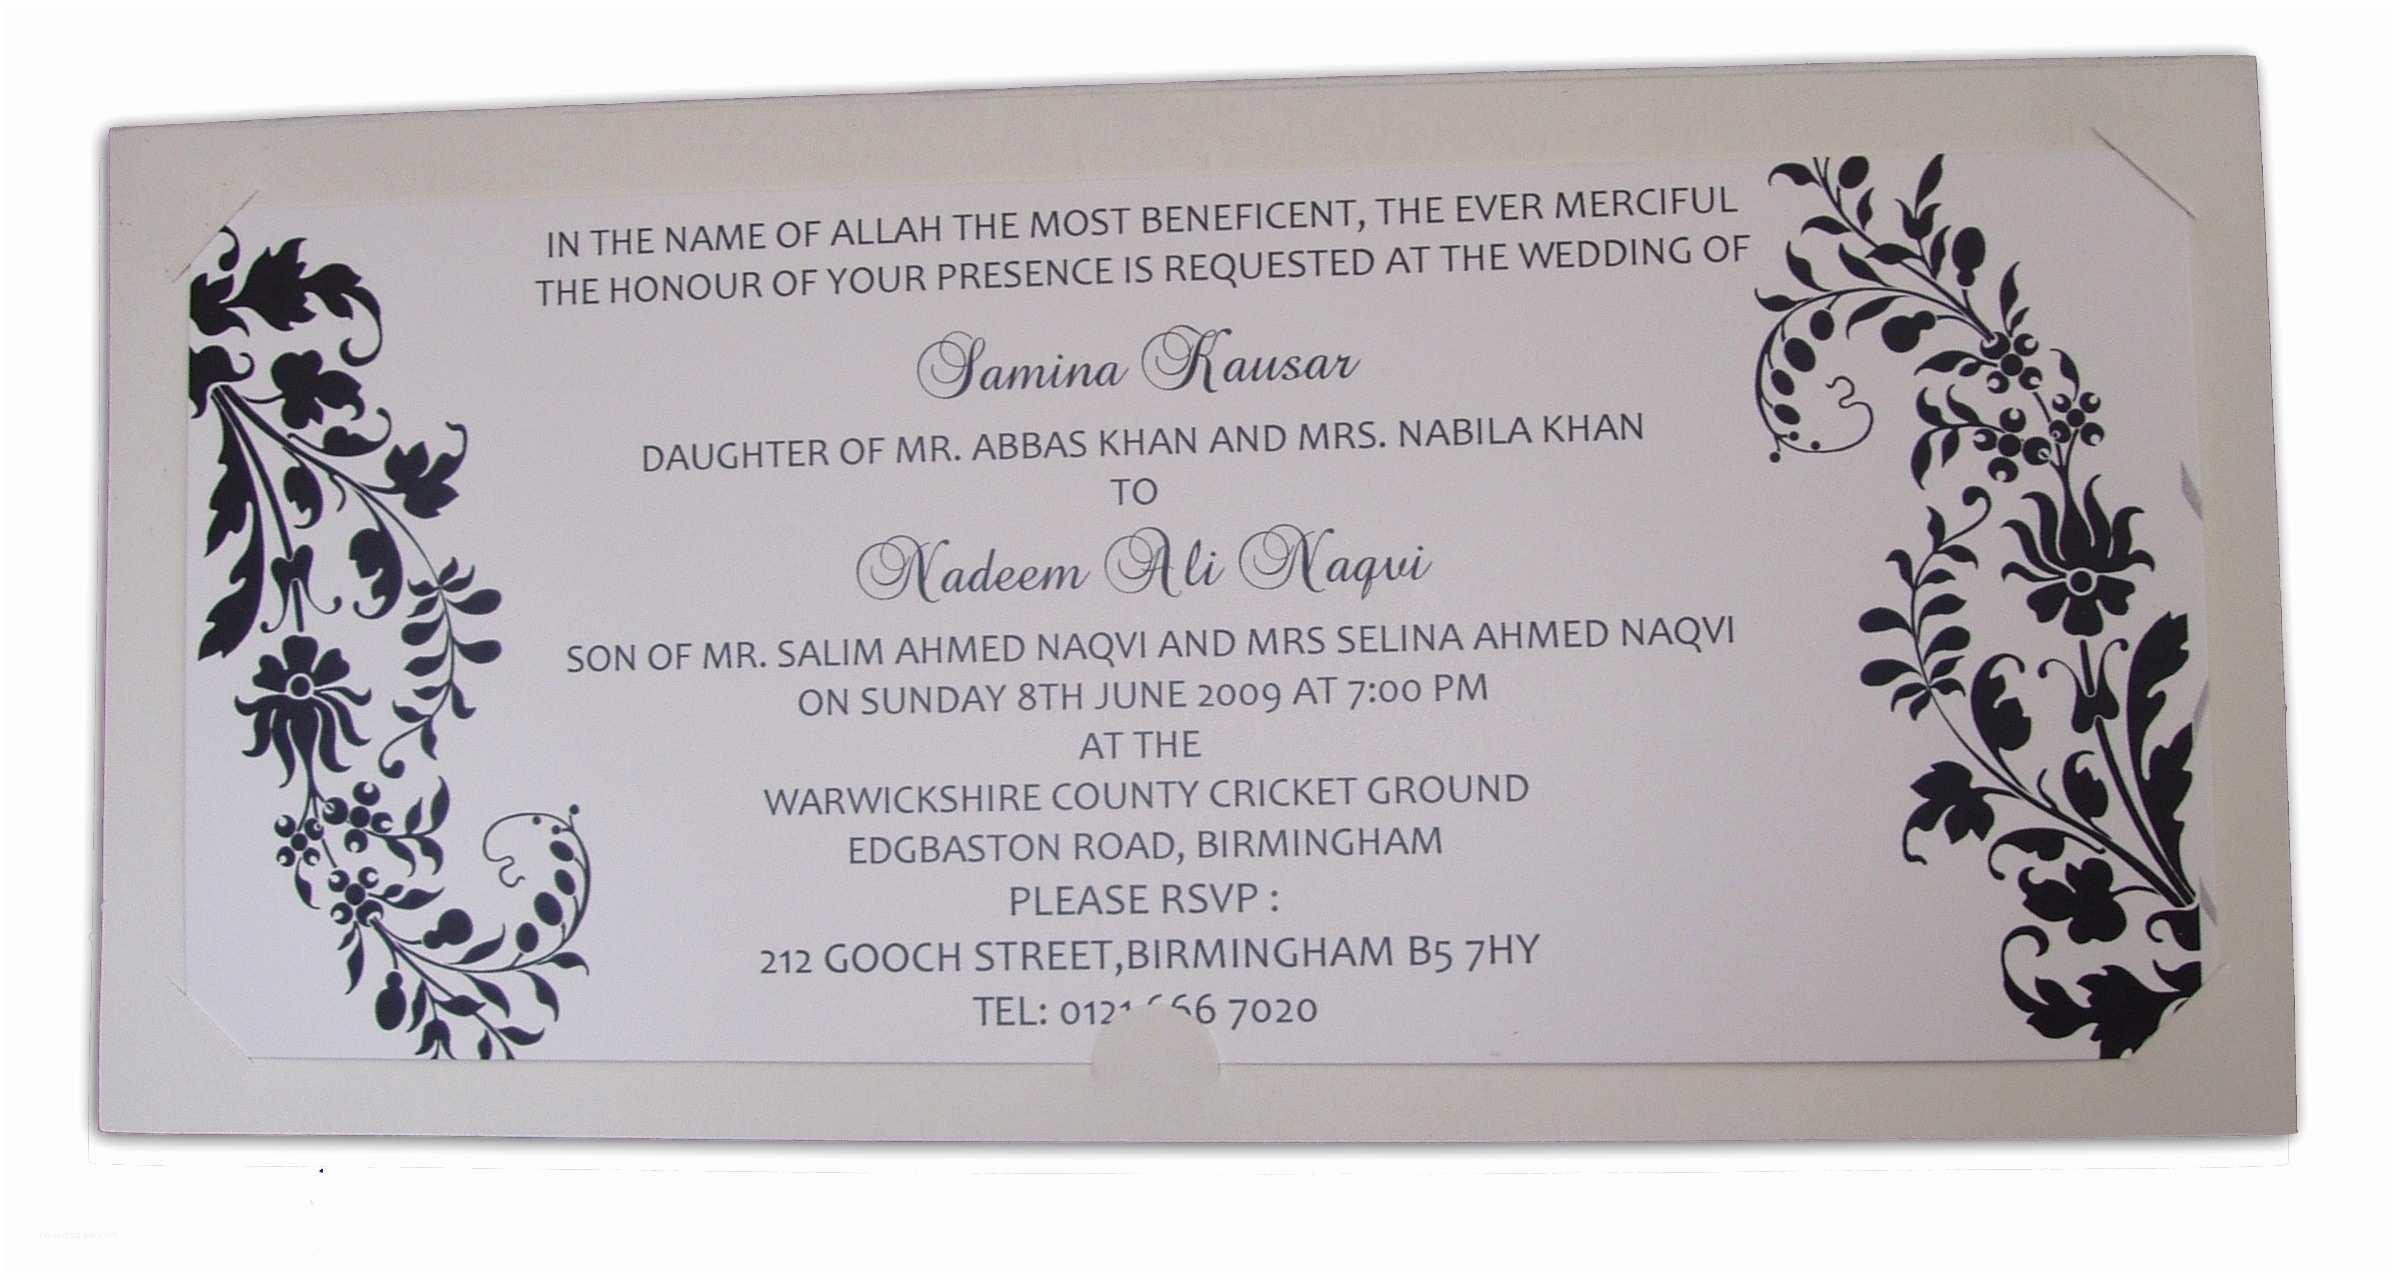 Wedding Invitation Card Online Ping Invitation Wording Uk And Menaka Card Line Wedding